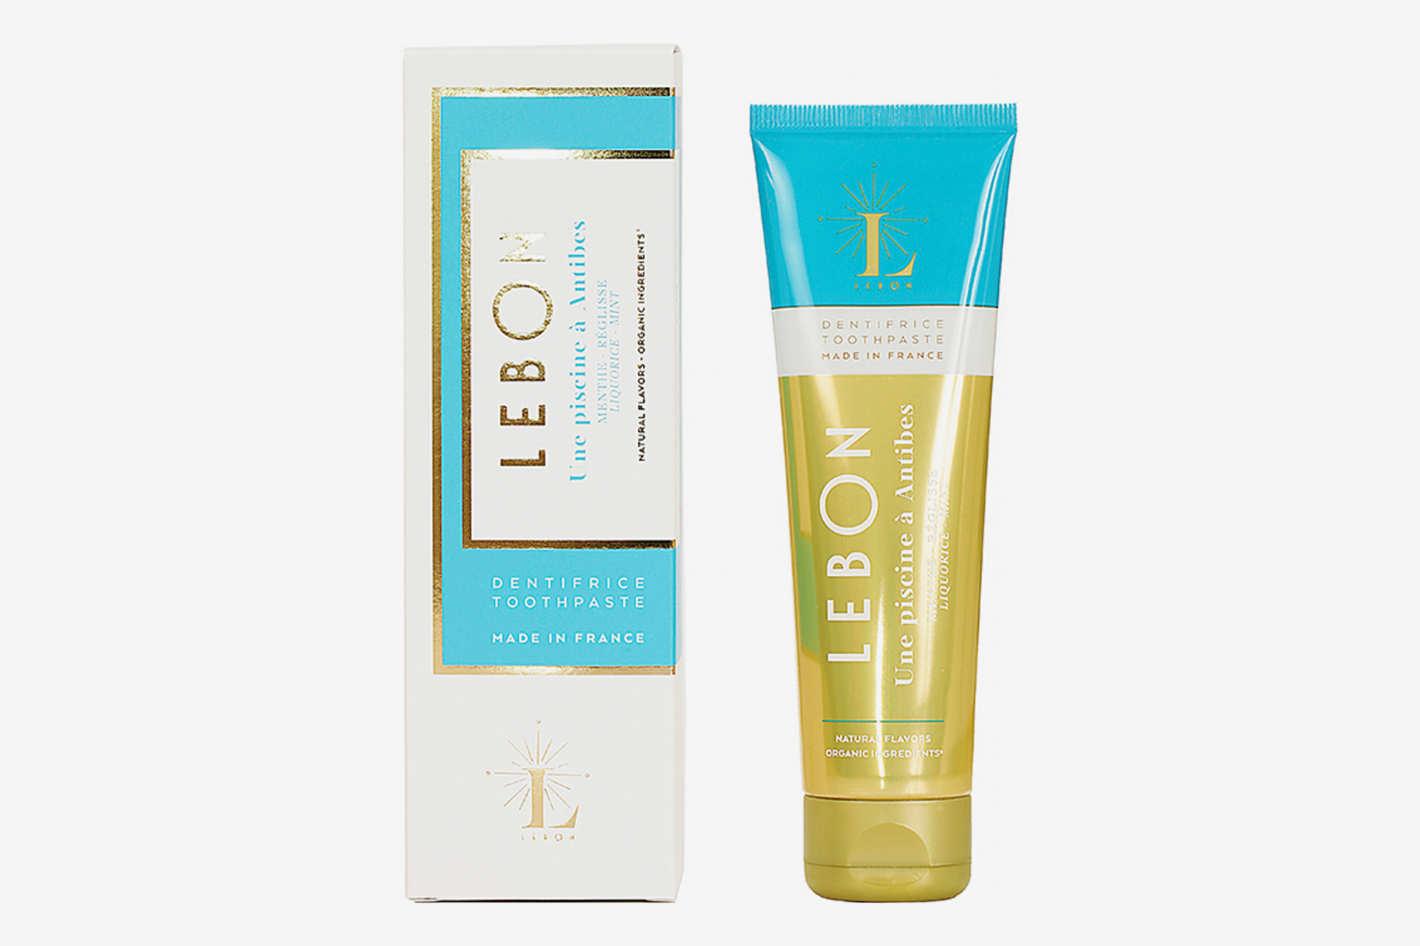 Lebon Piscine A Antibes (Liquorice + Mint) Organic Toothpaste